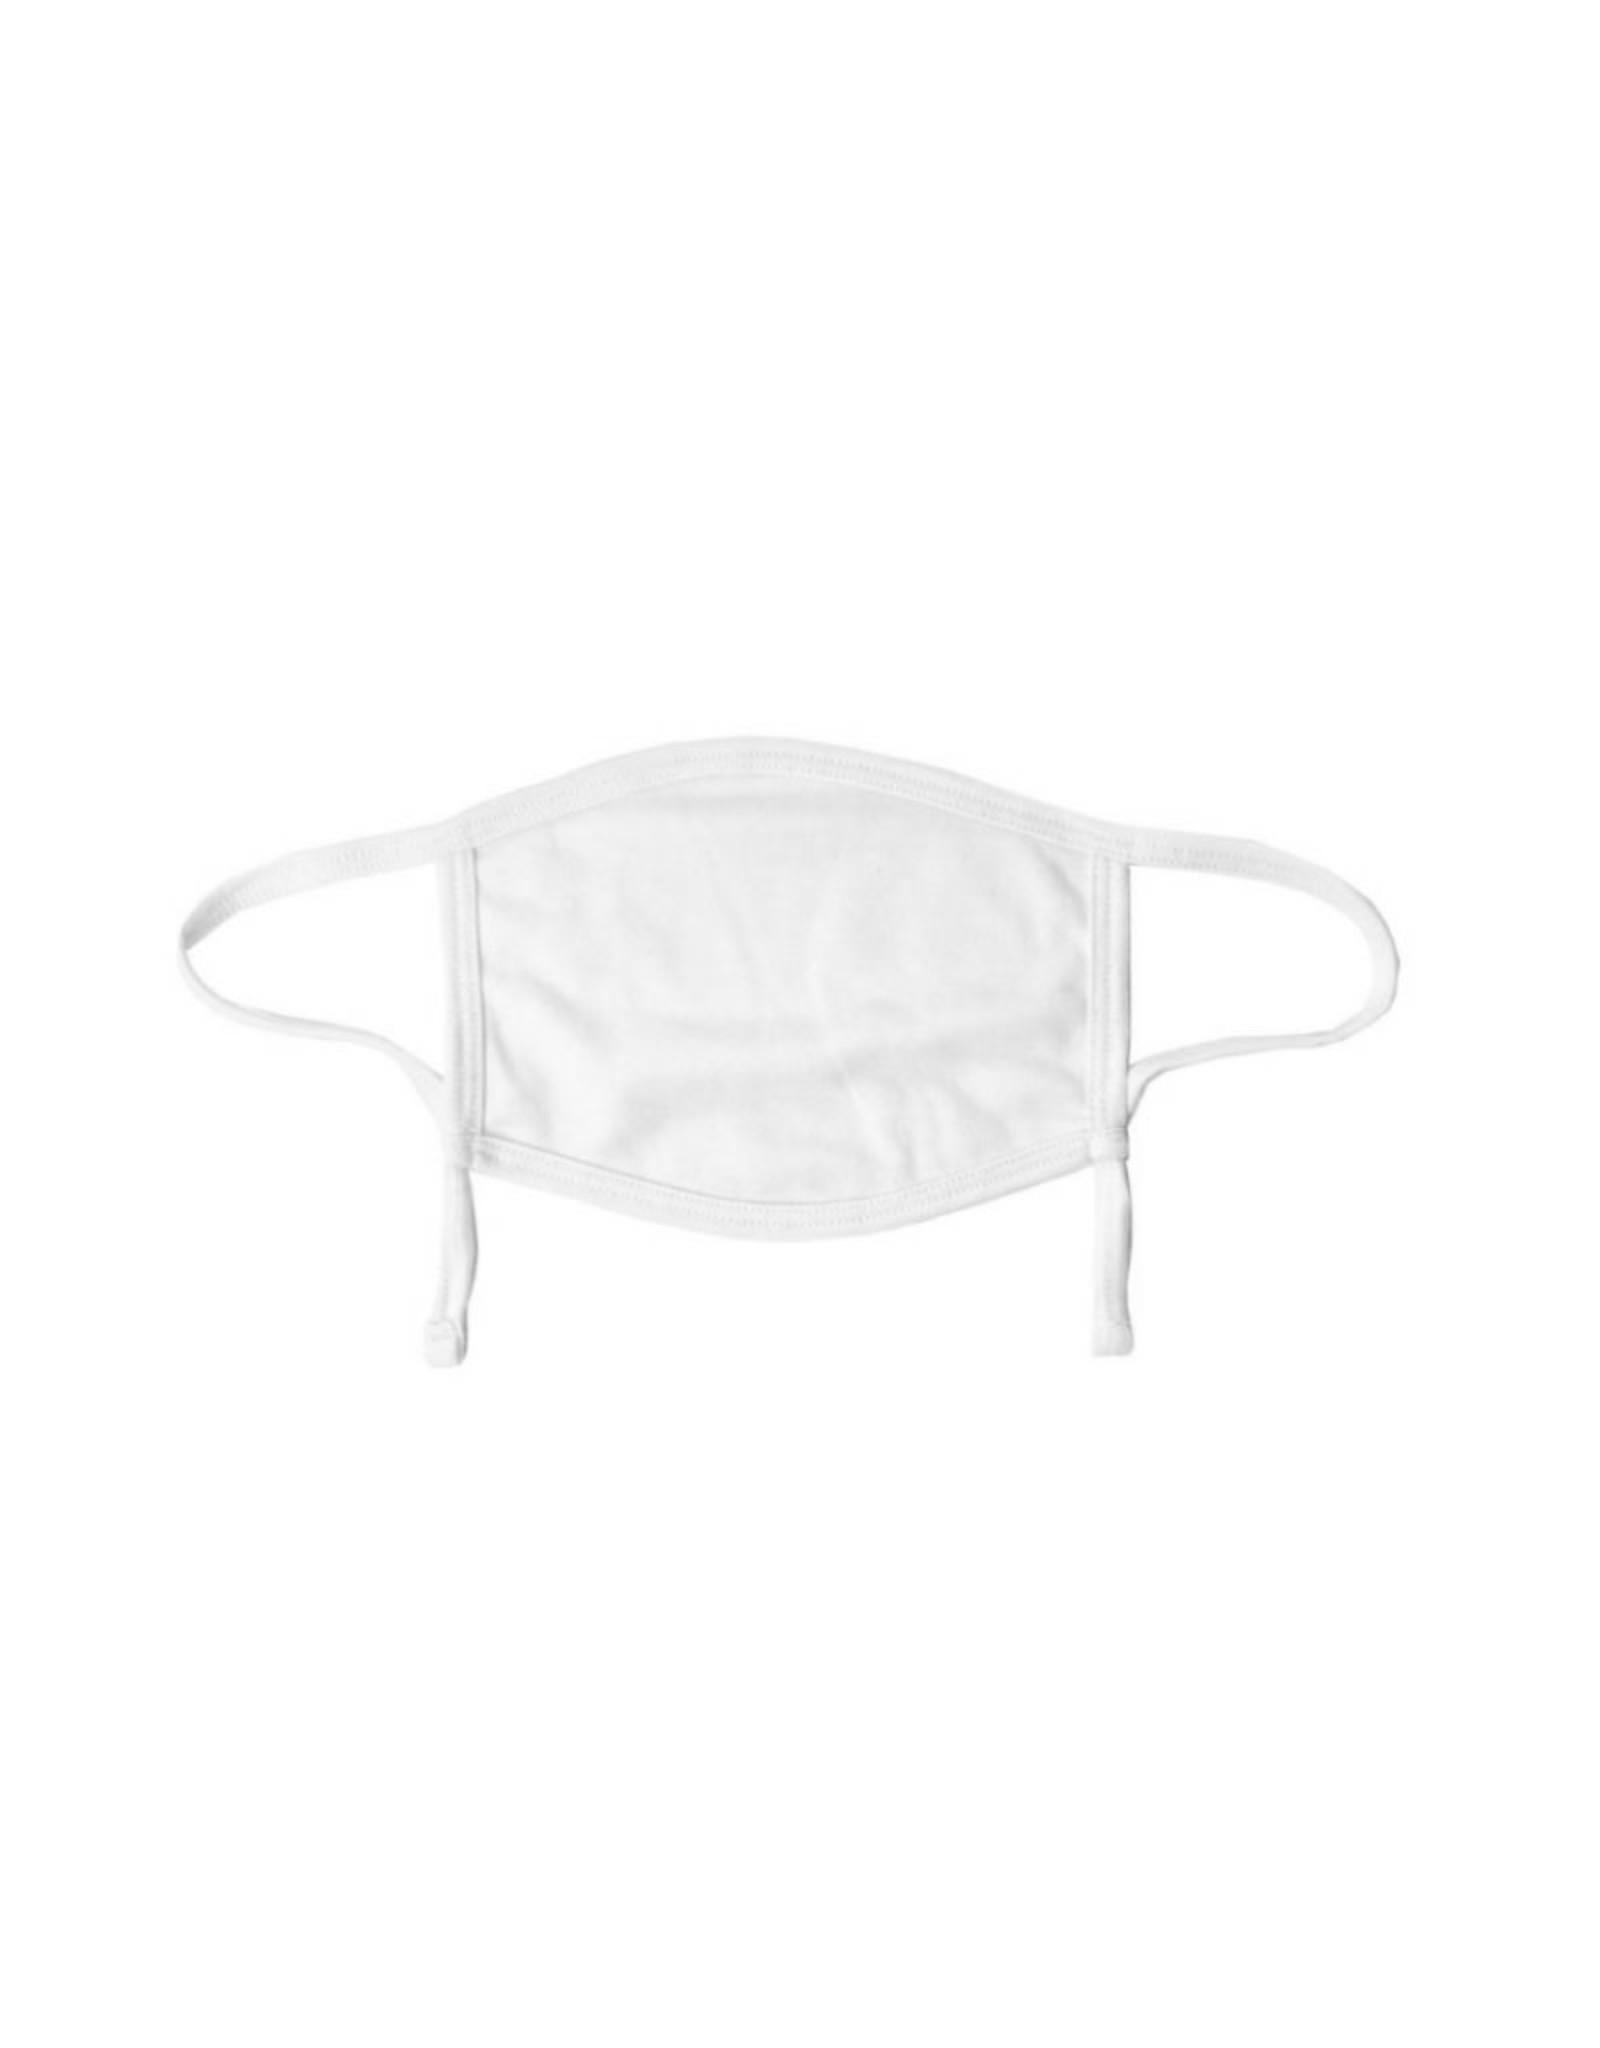 Youth Sublimation Adjustable Mask